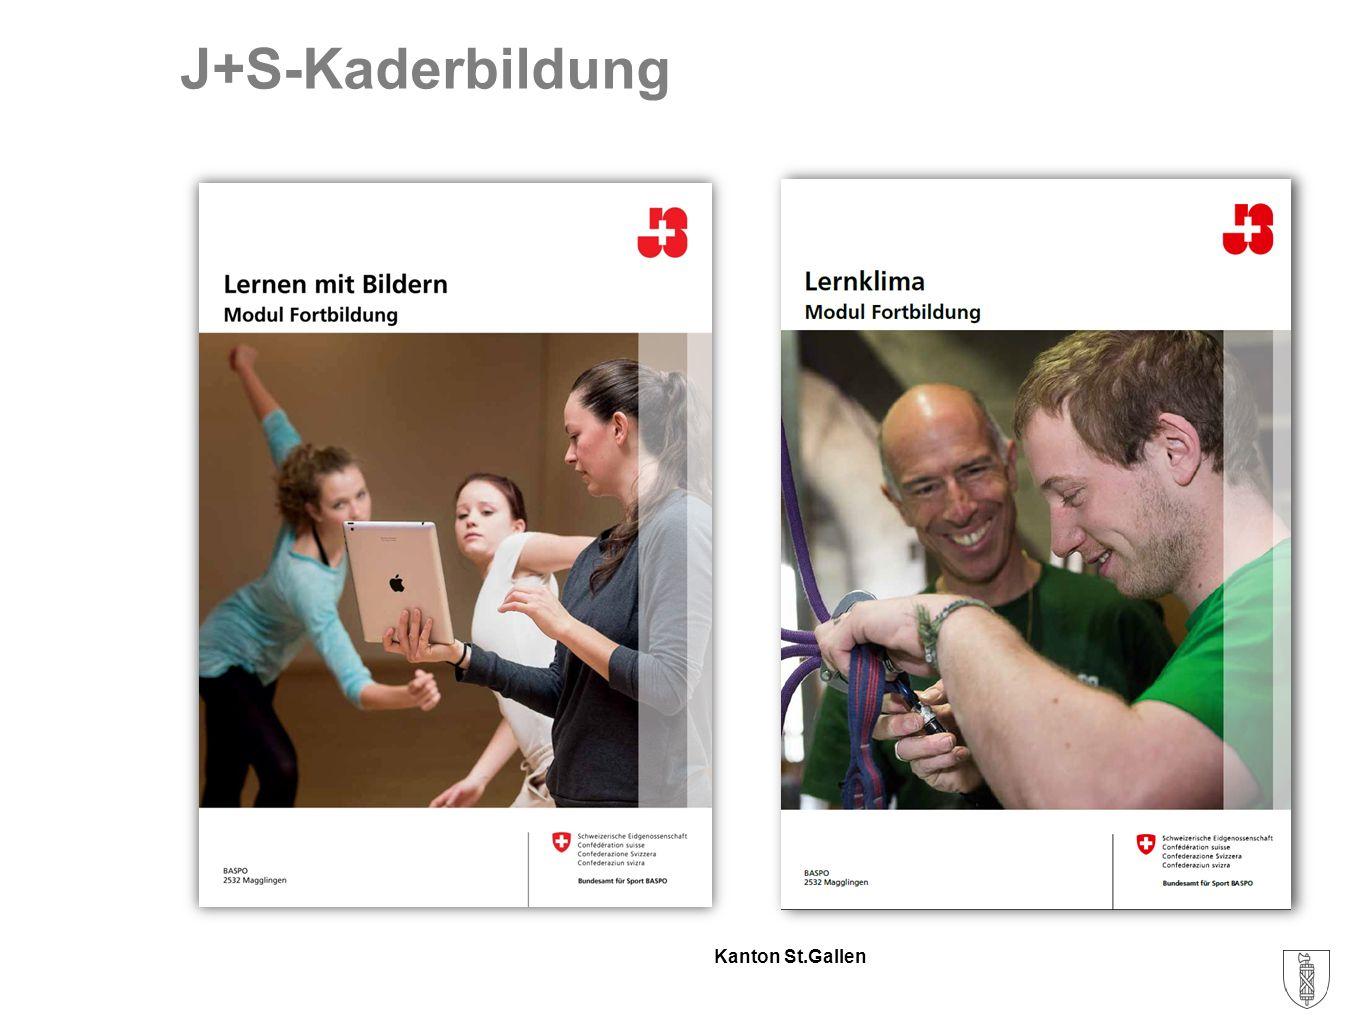 Kanton St.Gallen J+S-Kaderbildung